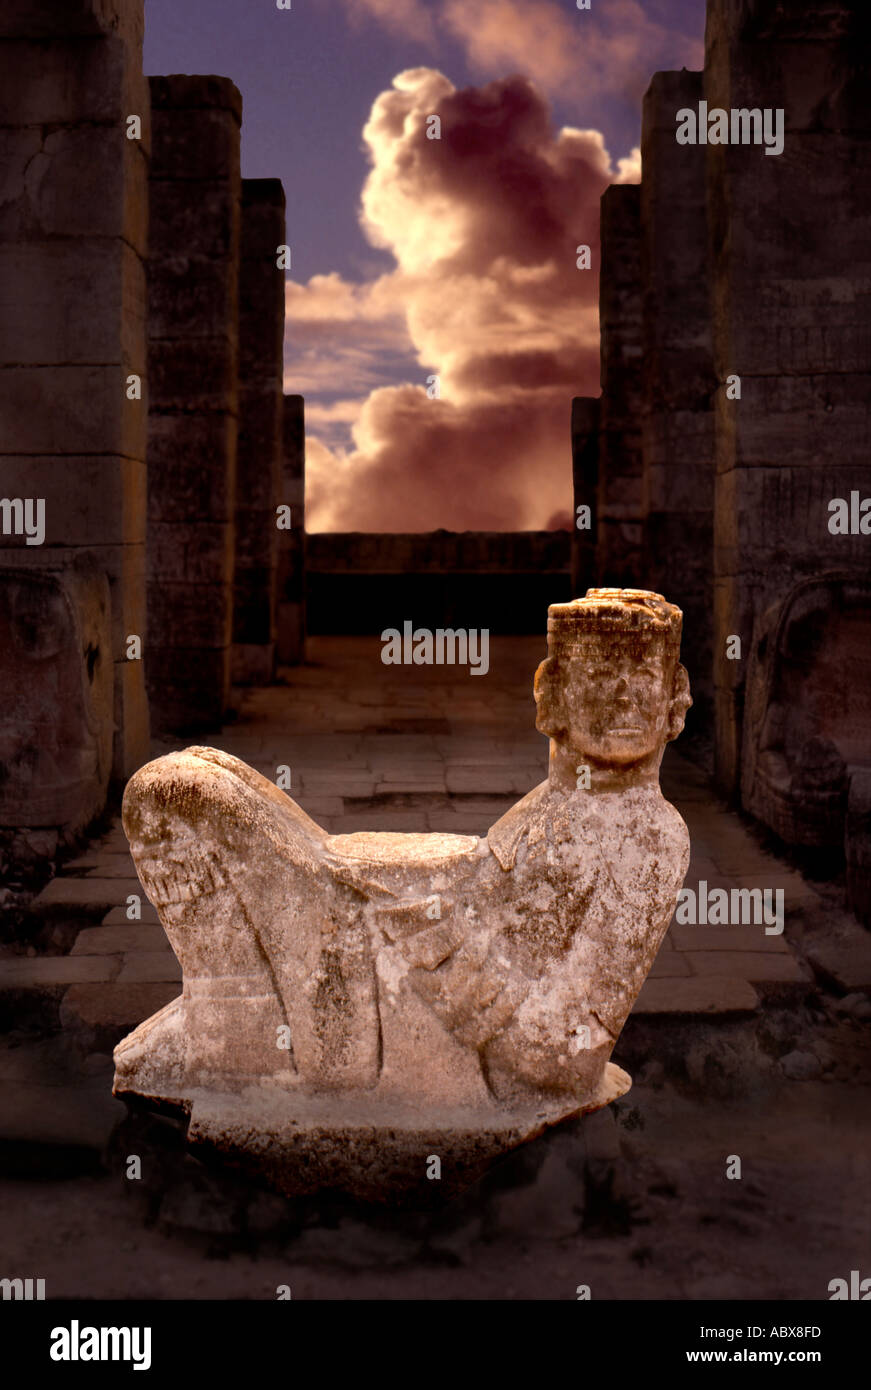 Mayan God Chac Mool, Chichén Itzá, Mexico - Stock Image